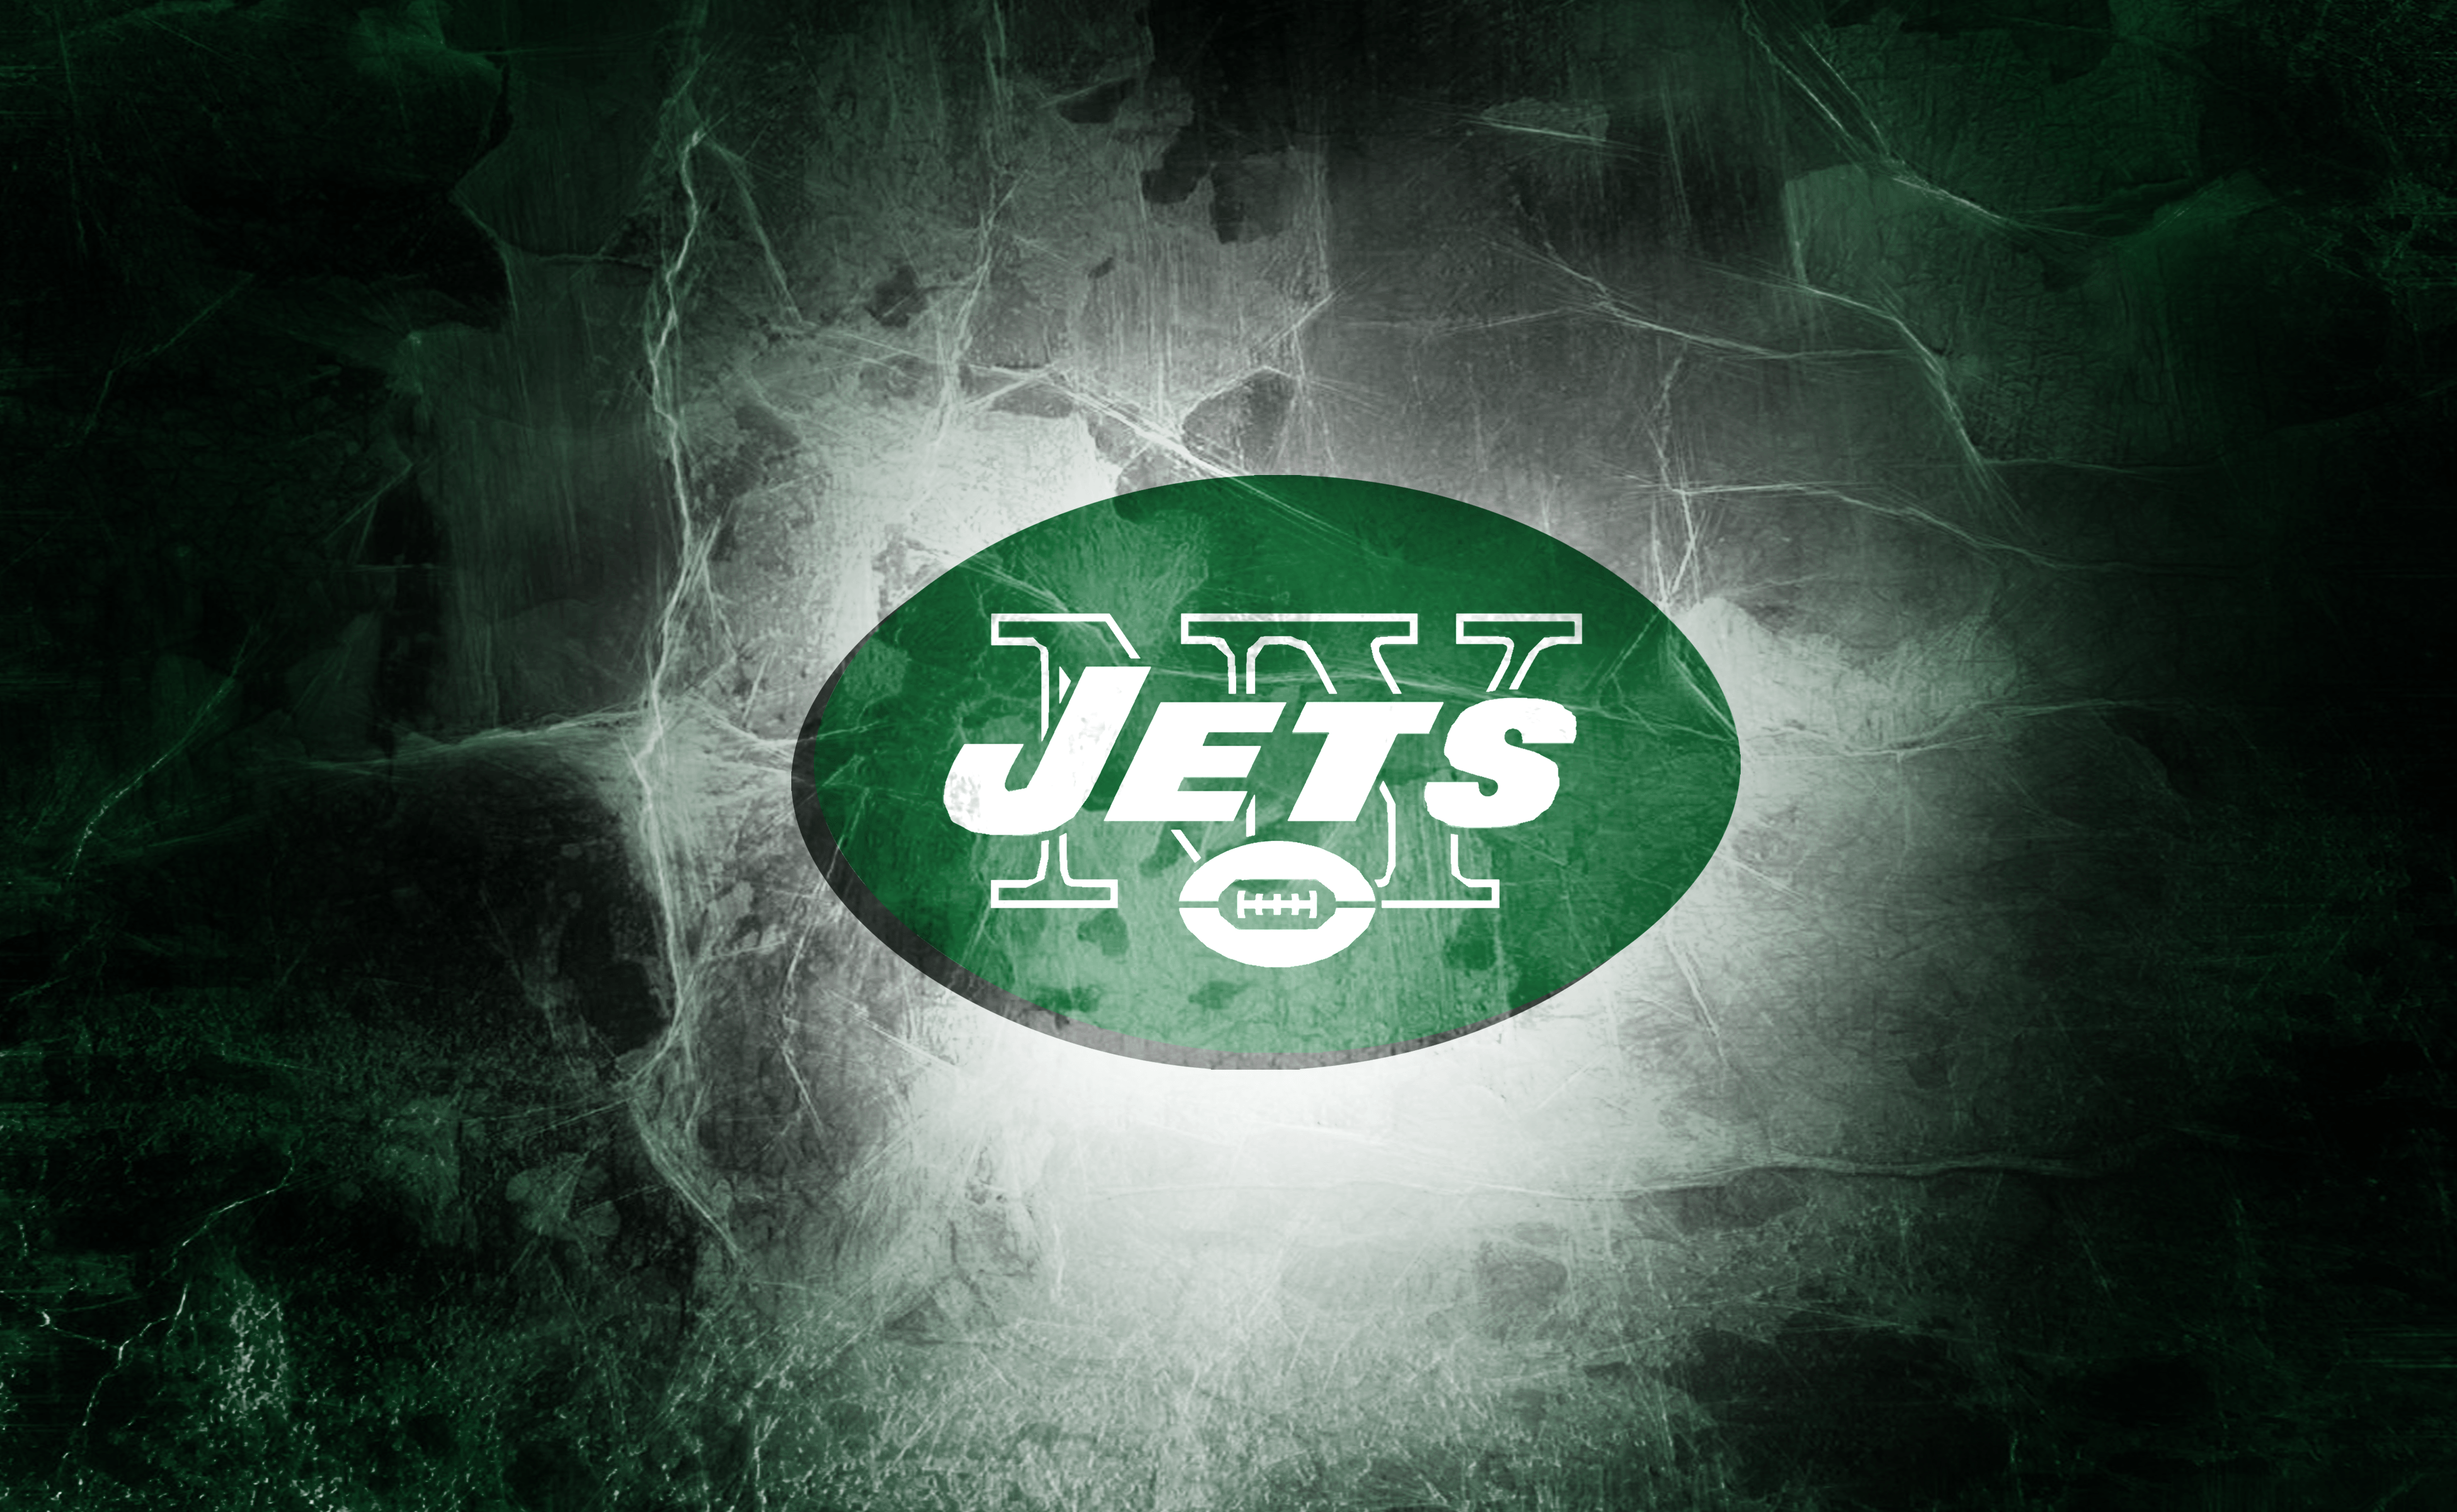 wallpapers new york jet -#main